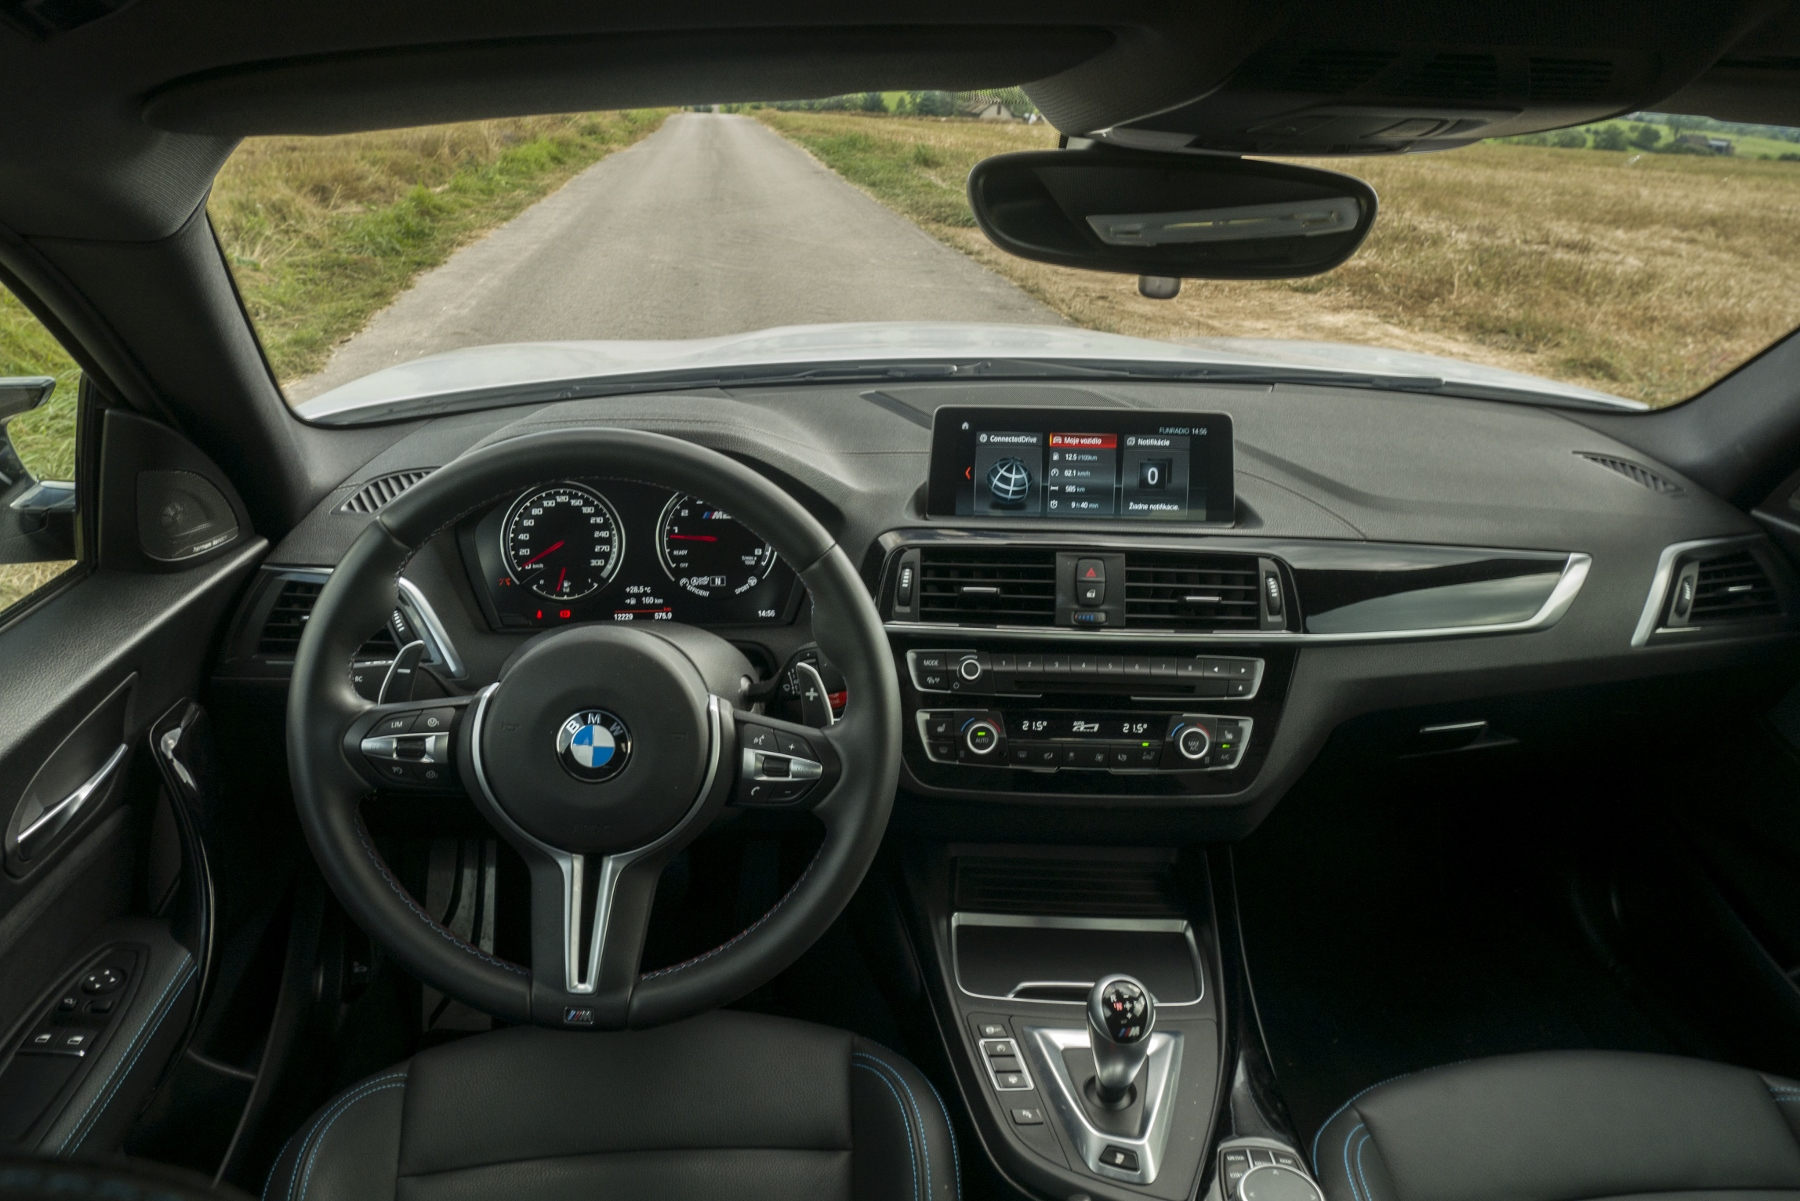 Test: BMW M2 Competition je nálož plná zábavy flfa7E58nf bmw-m2-16